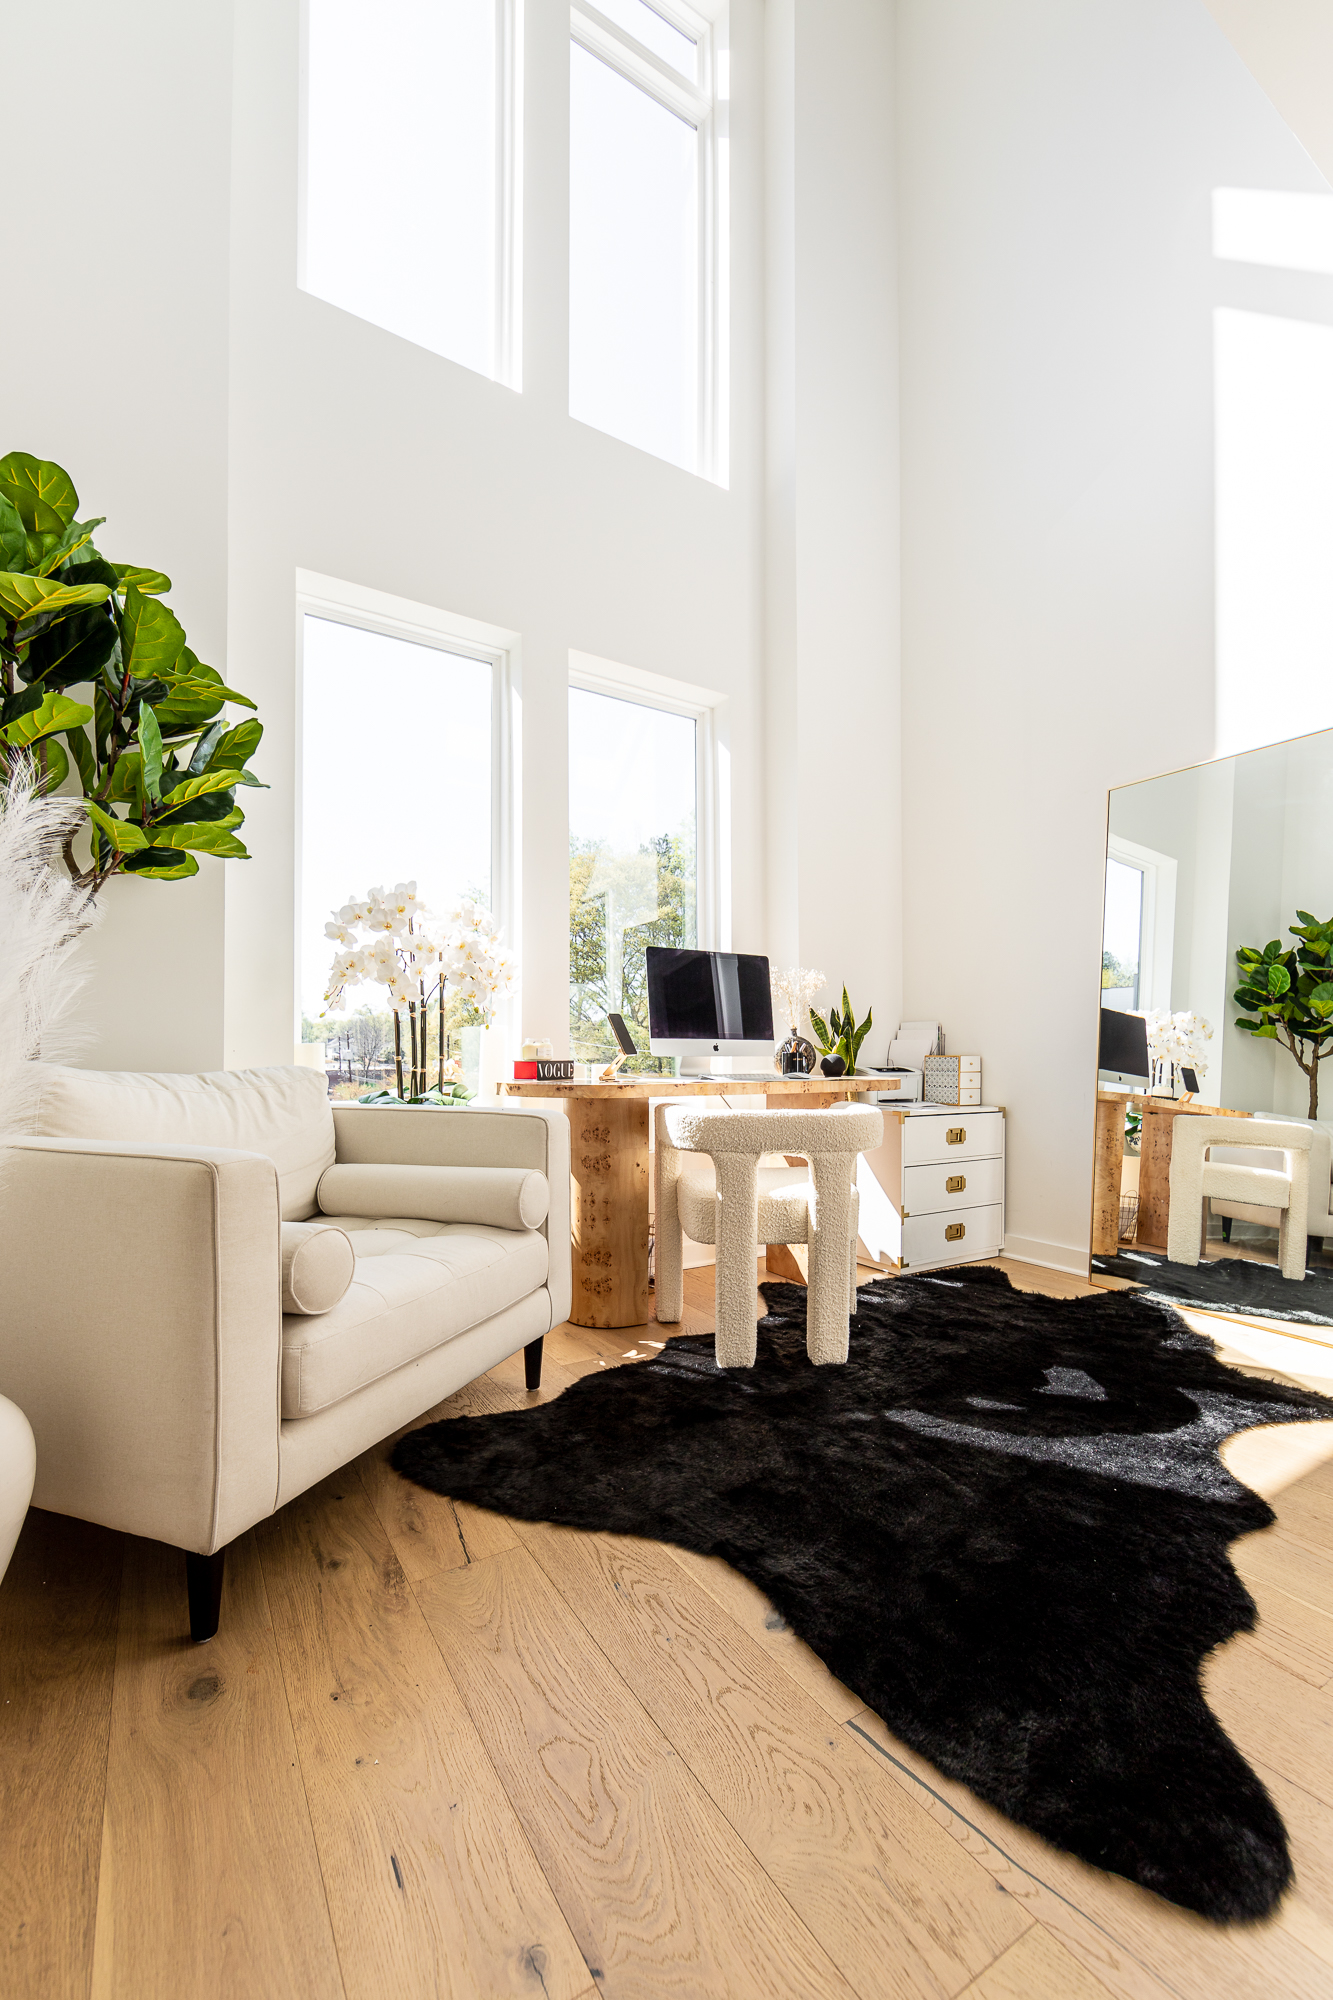 feminine home office ideas, feminine home office decor, burlwood desk, burl desk, boucle dining chair, boucle office chair, white home office, creative home office ideas